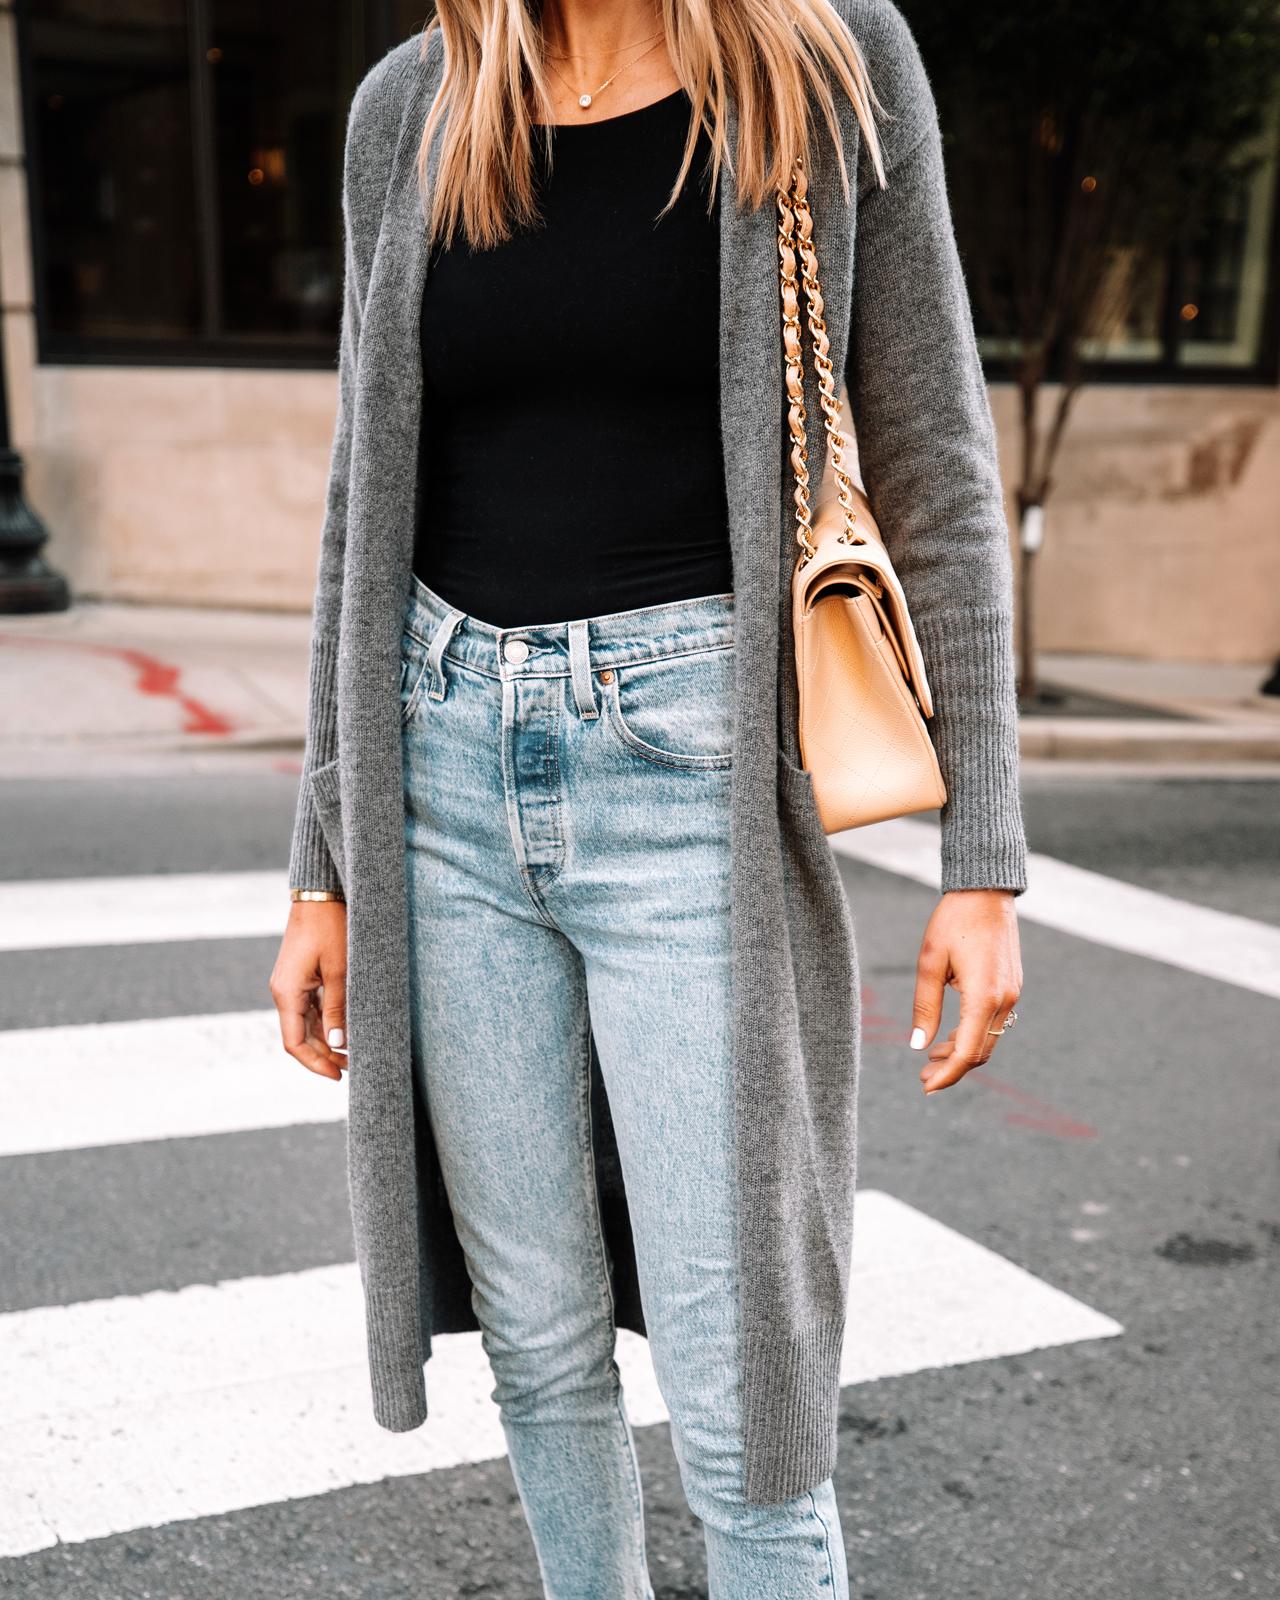 Fashion Jackson Wearing Grey Long Cardigan Black Bodysuit Levis 501 skinny jeans